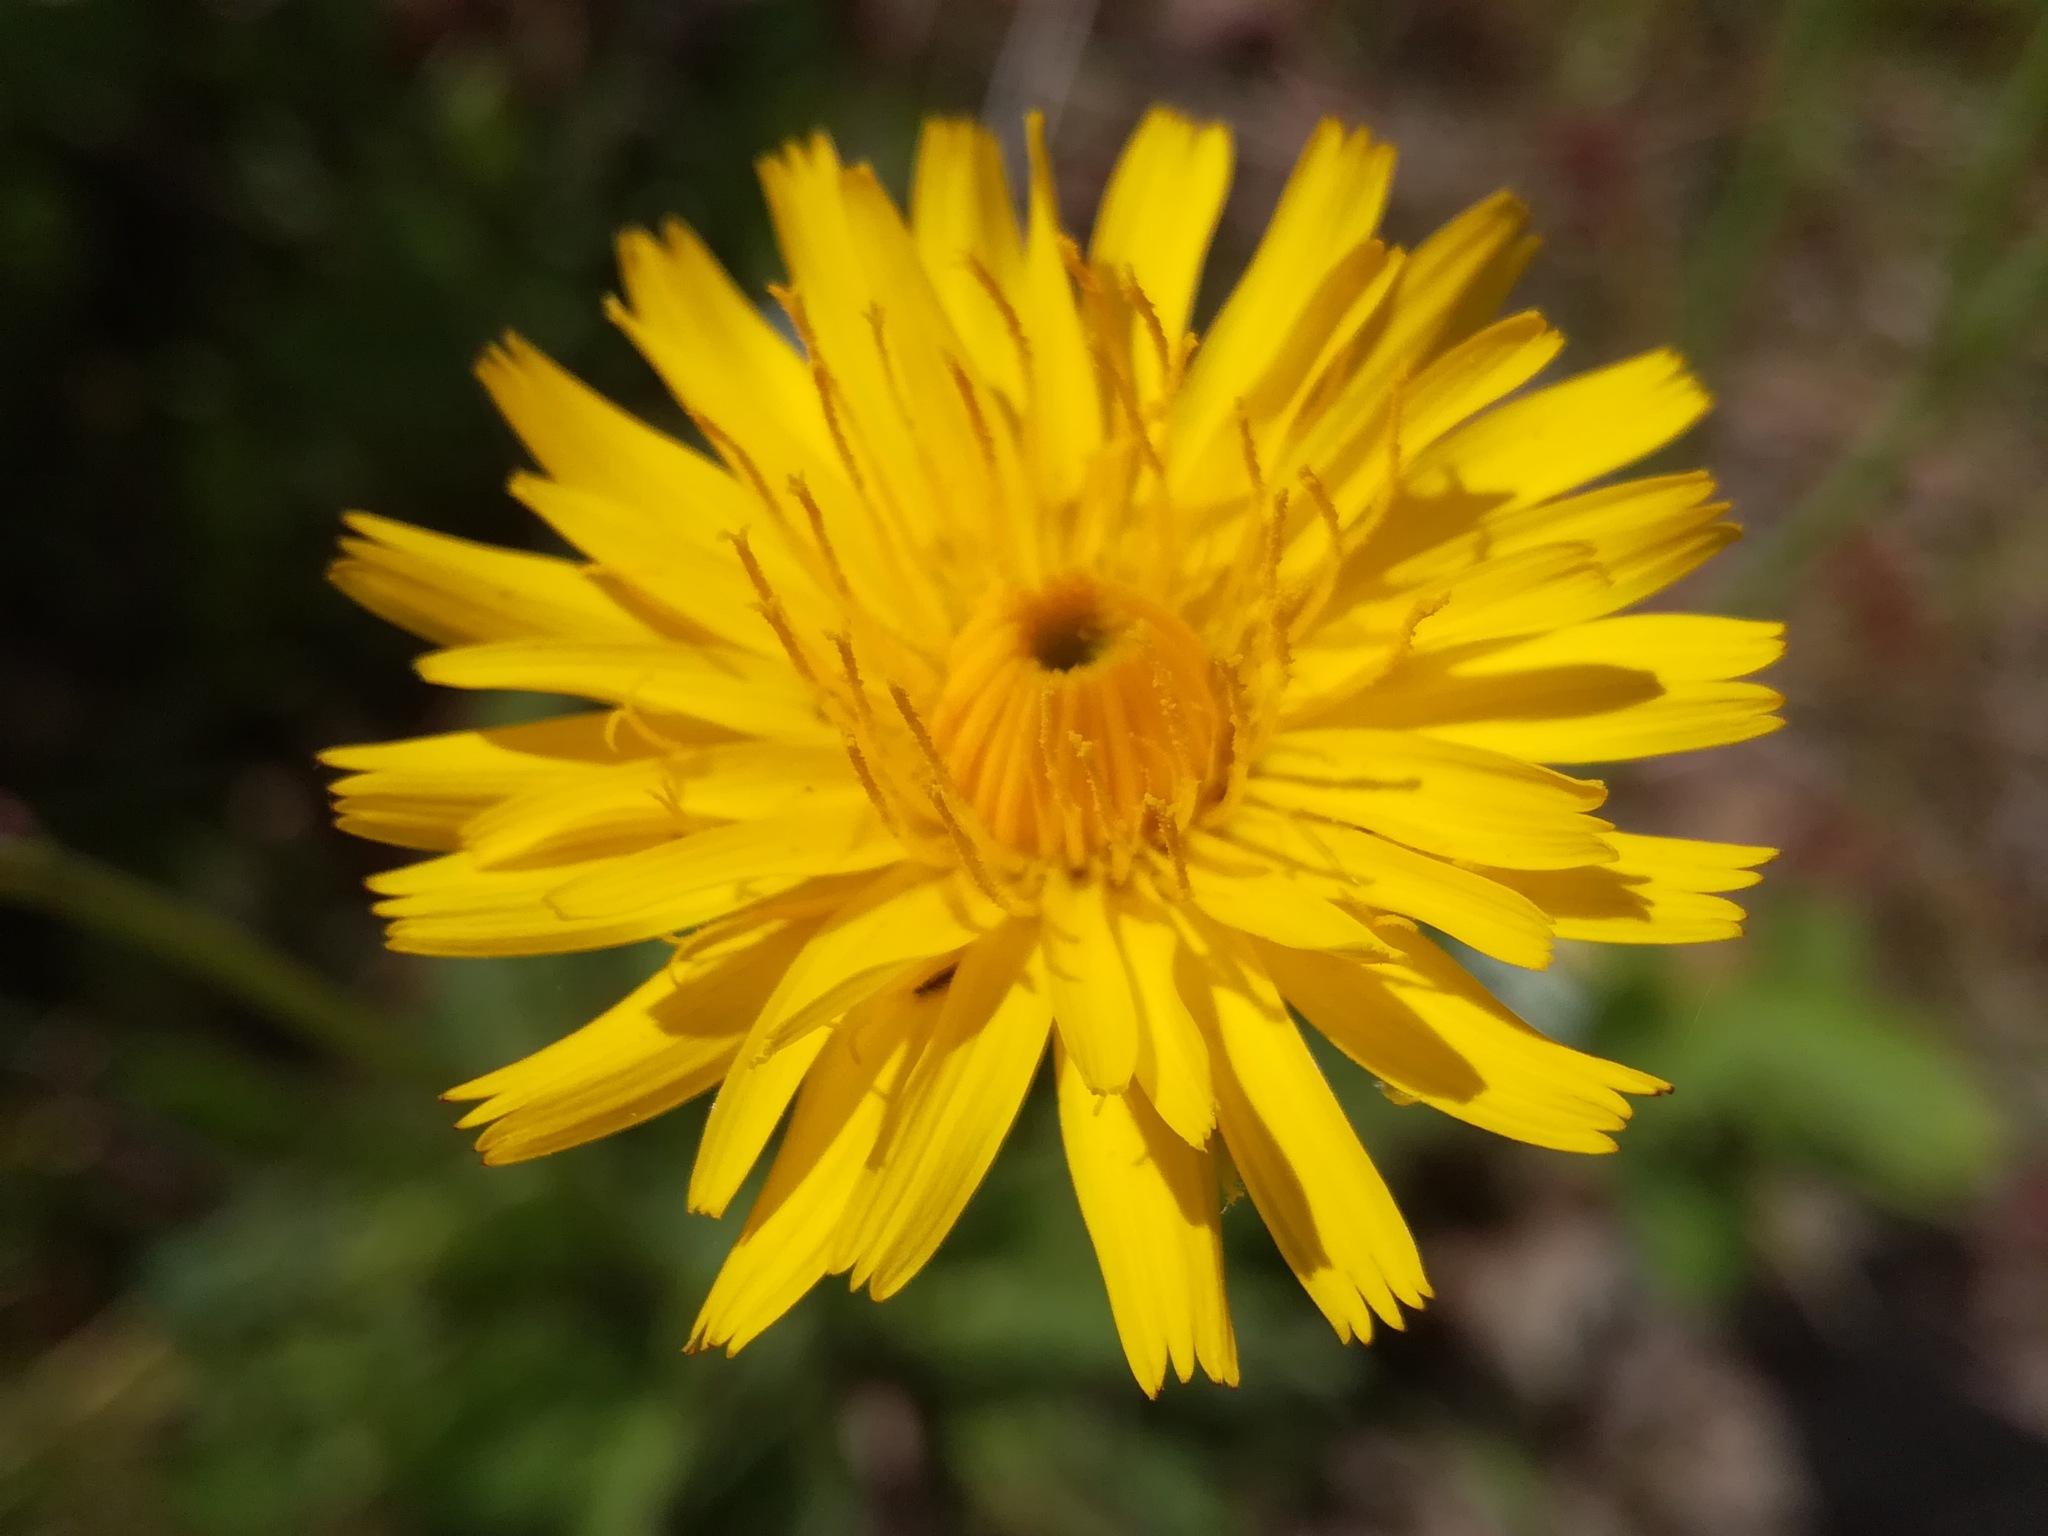 Yellow flower by uzkuraitiene62